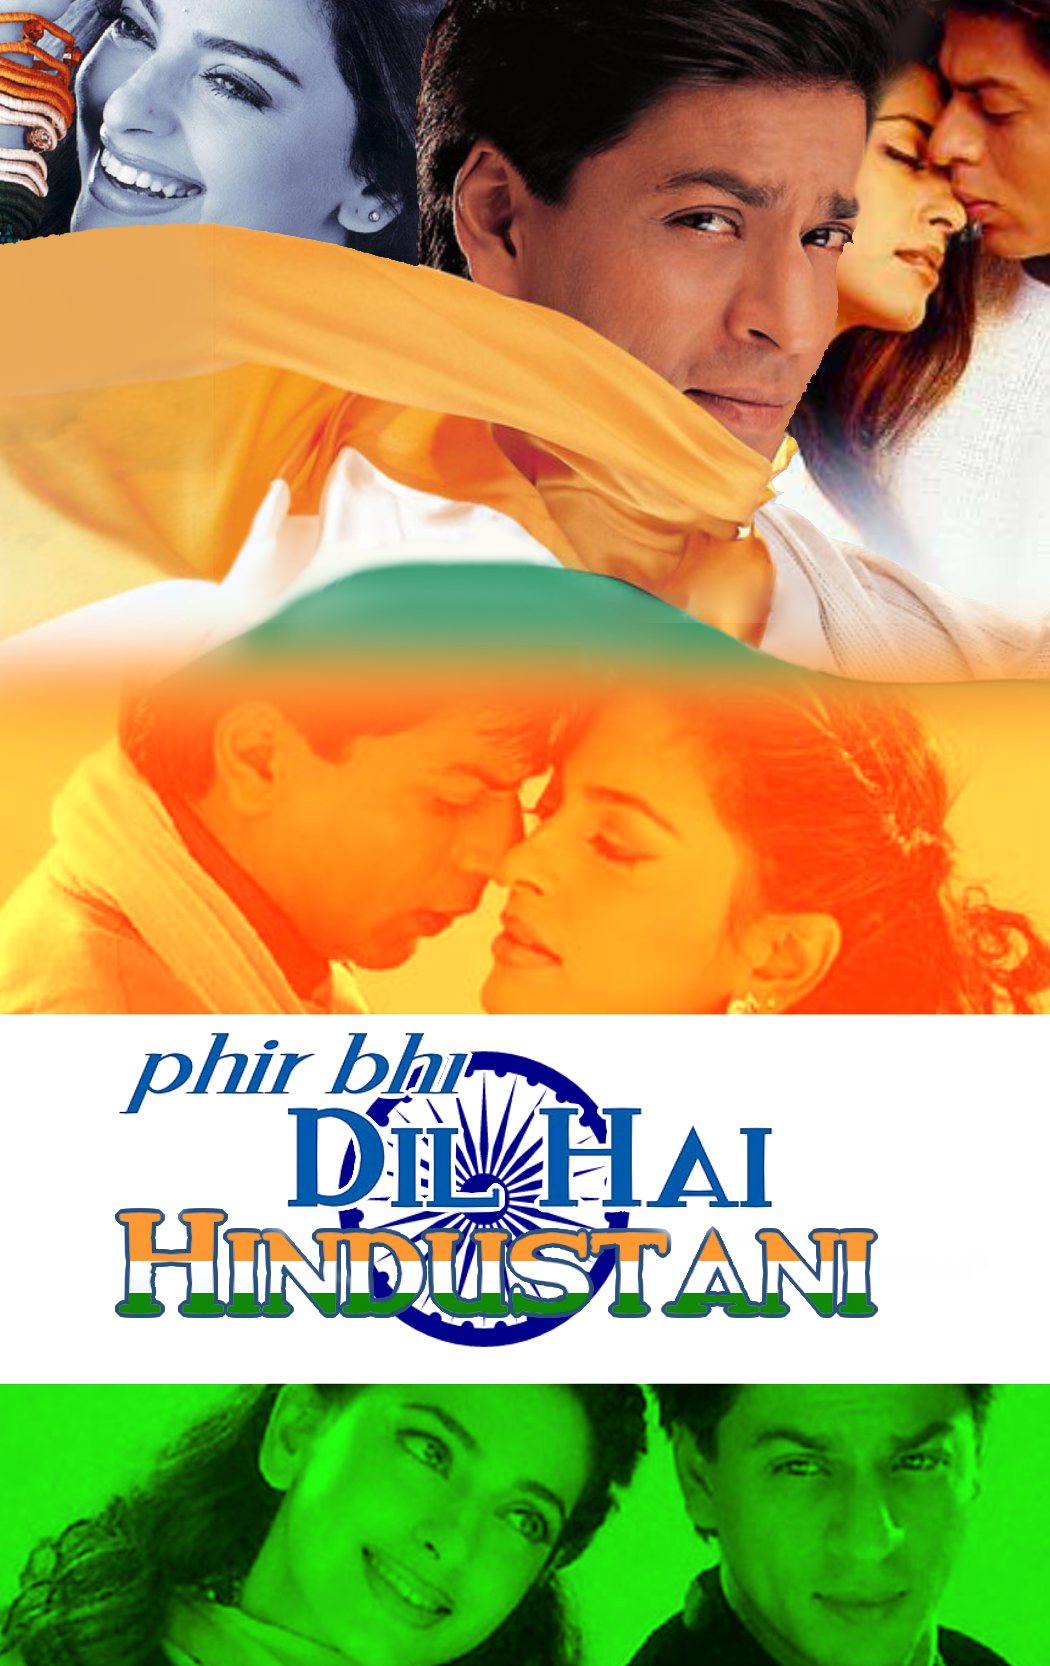 phir bhi dil hai hindustani poster Bollywood movies